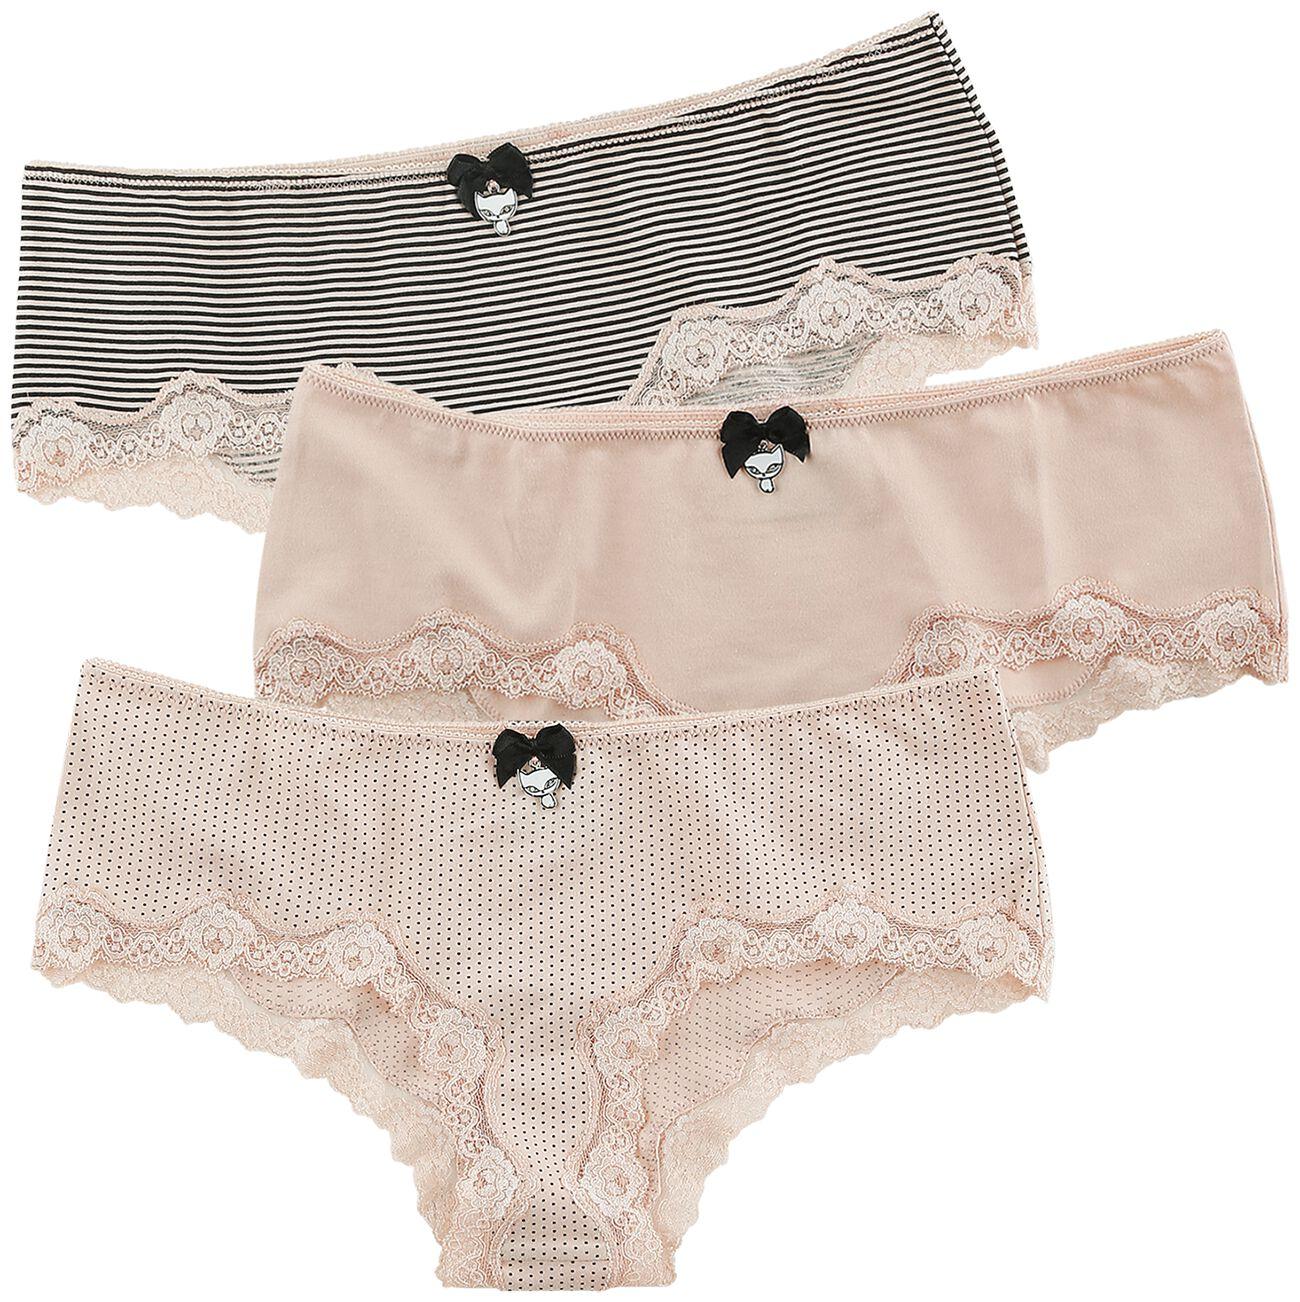 Waesche für Frauen - Pussy Deluxe 3er Set Hipster Pants Panty Set rosa schwarz  - Onlineshop EMP